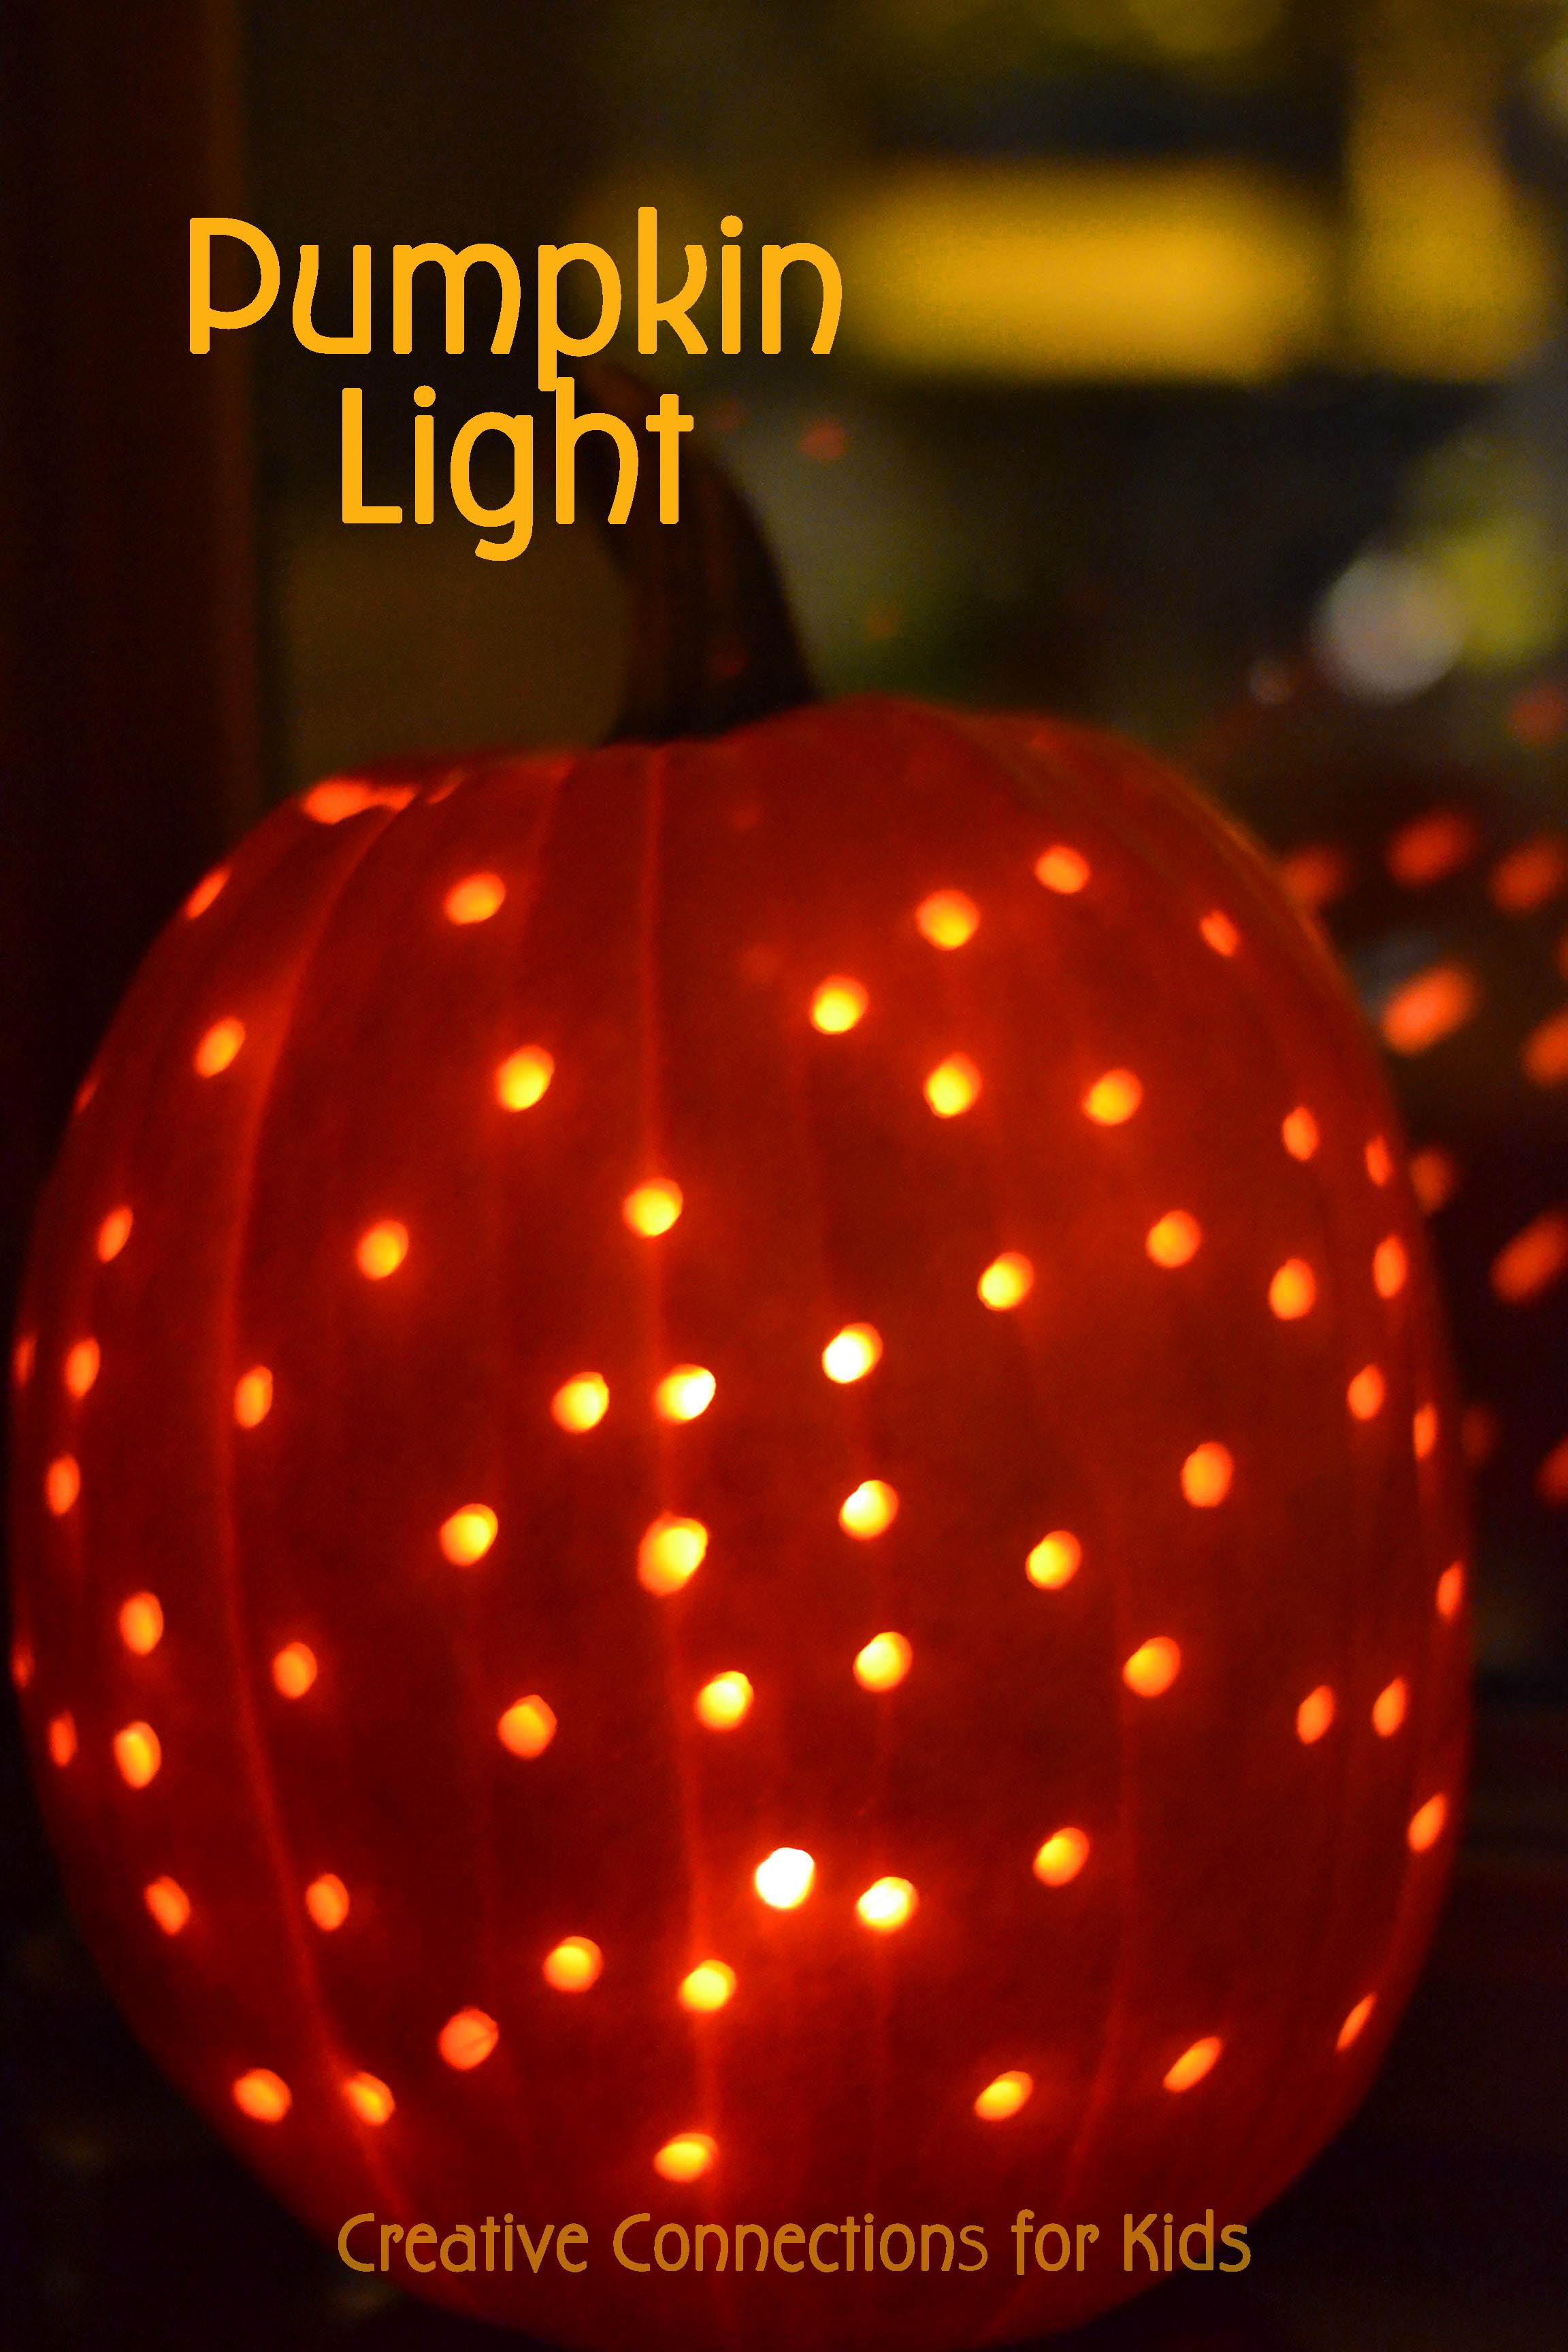 Happy bet bet at home Bonus września at home wskazówki ruletka bet at home RedeemVoucherCode Ghost Pumpkin